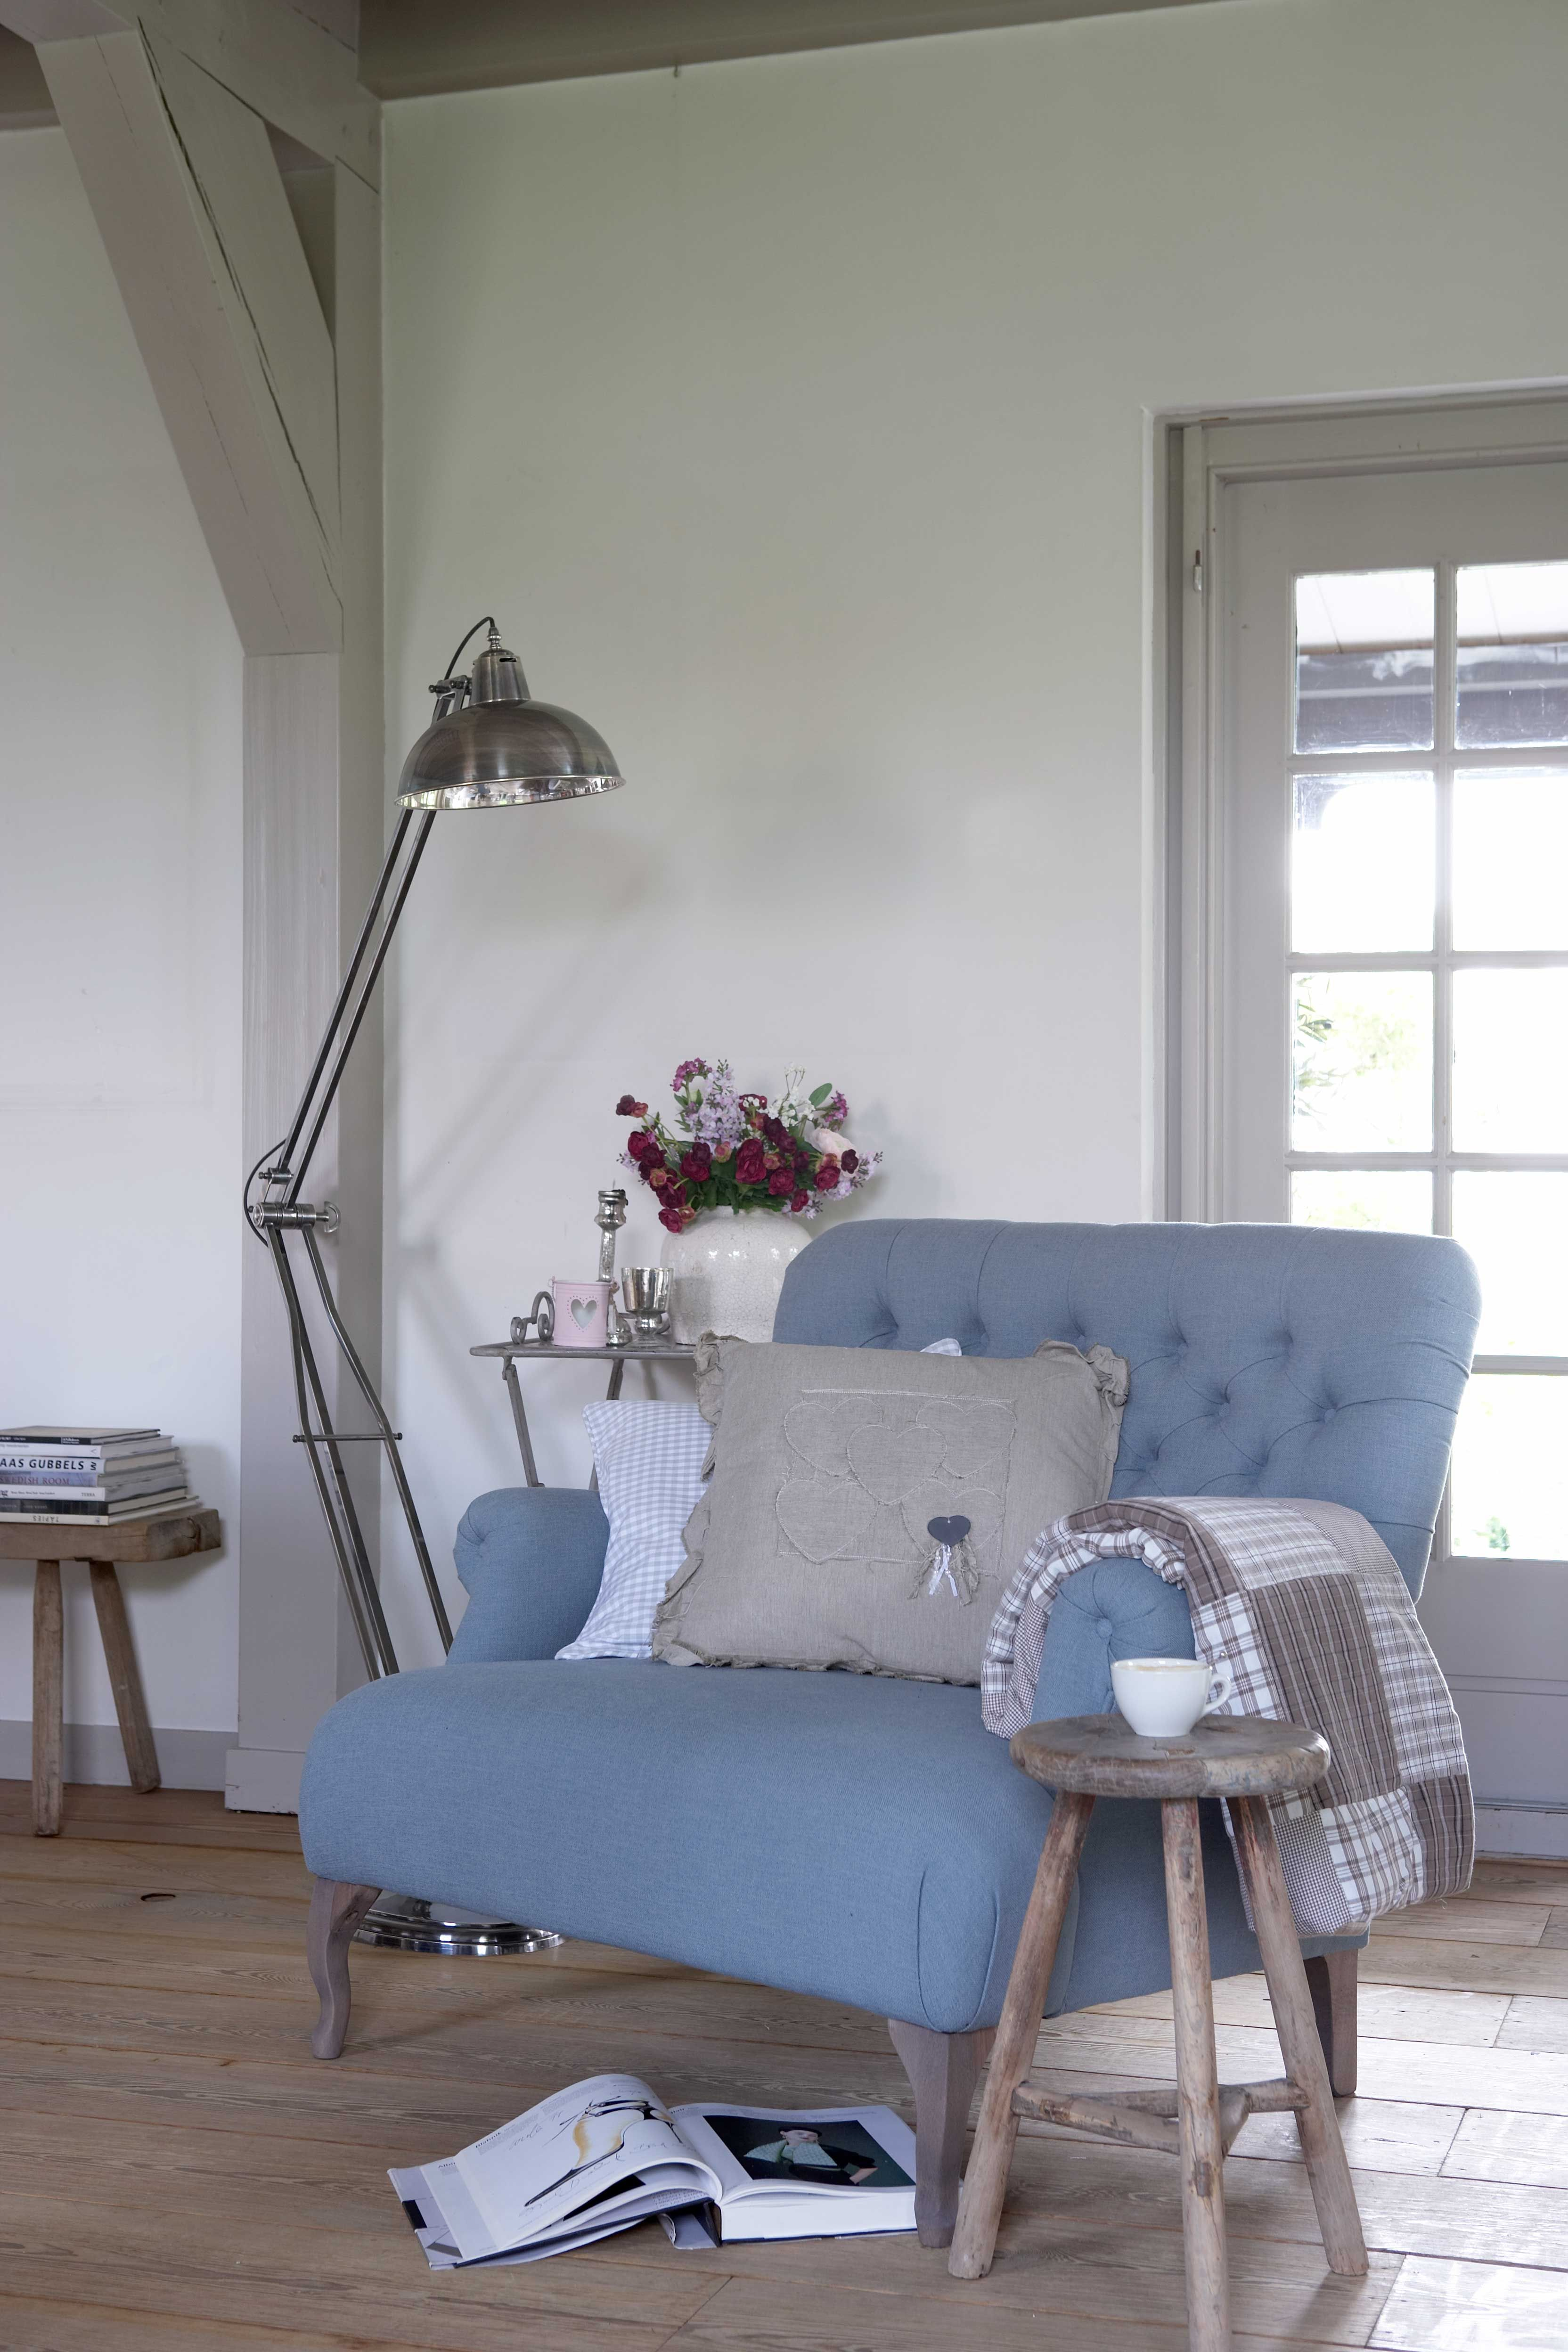 Gezellig samenkruipen in deze blauwe loveseat  Interieur